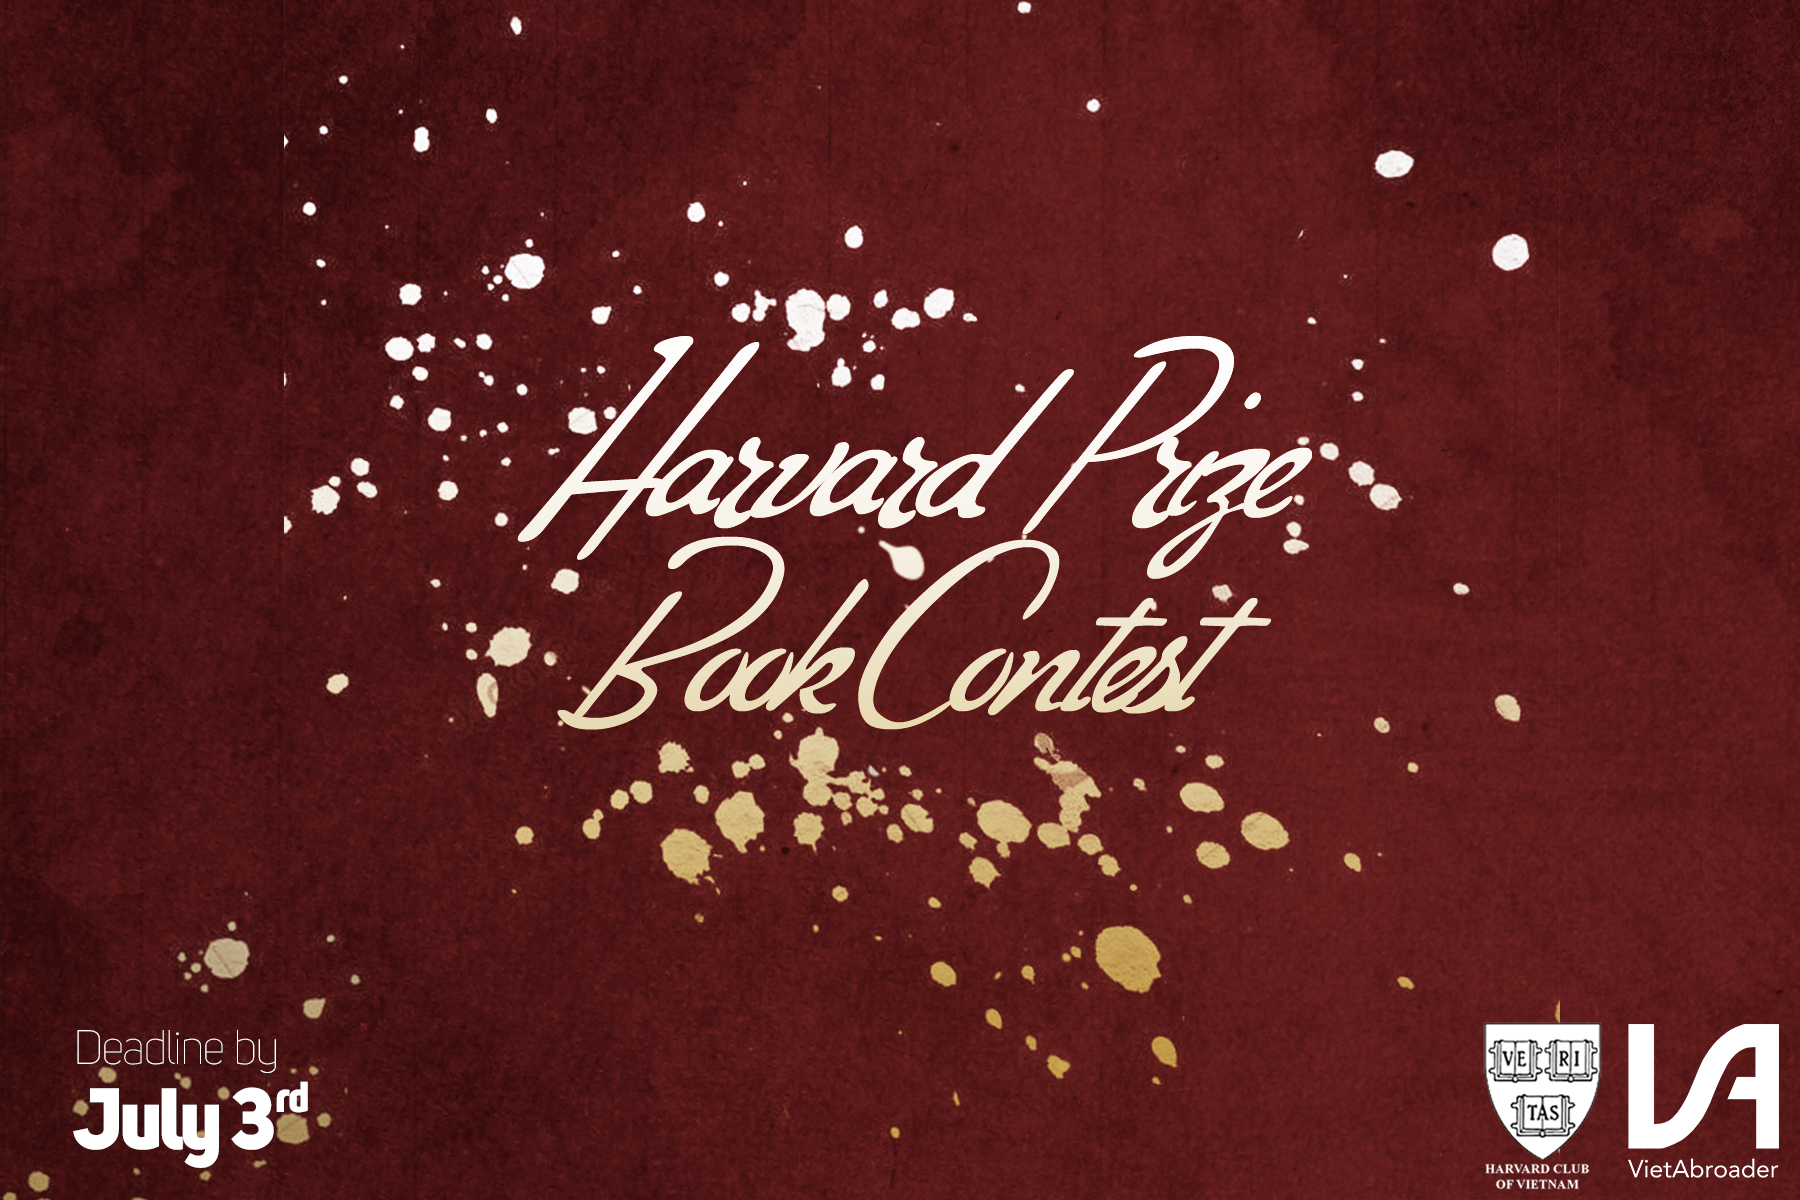 HPBC - horizontal